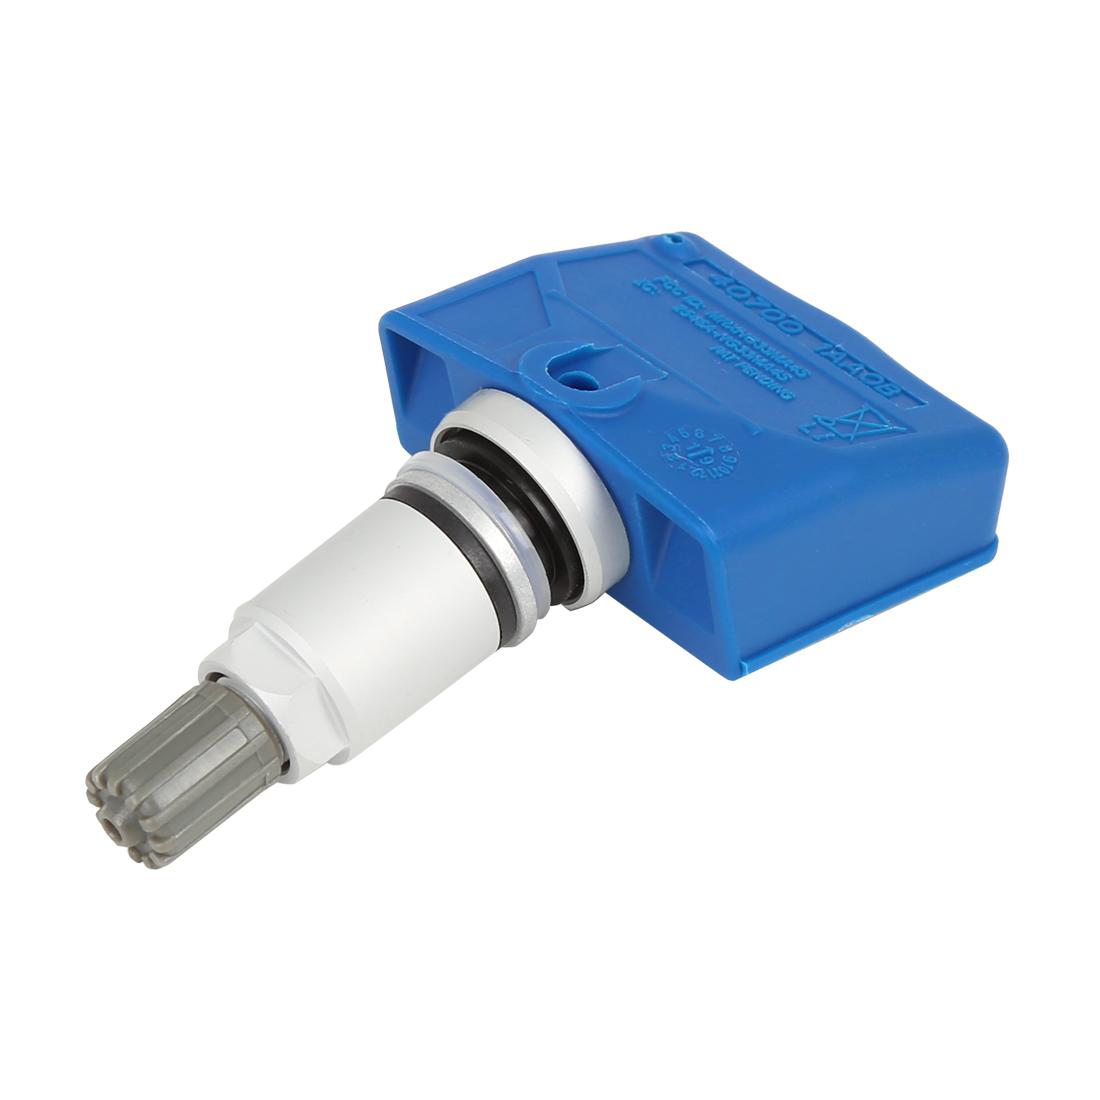 40700-1AA0B Car Tire Pressure Sensor TPMS 315MHz for Infiniti M35 2008-2010